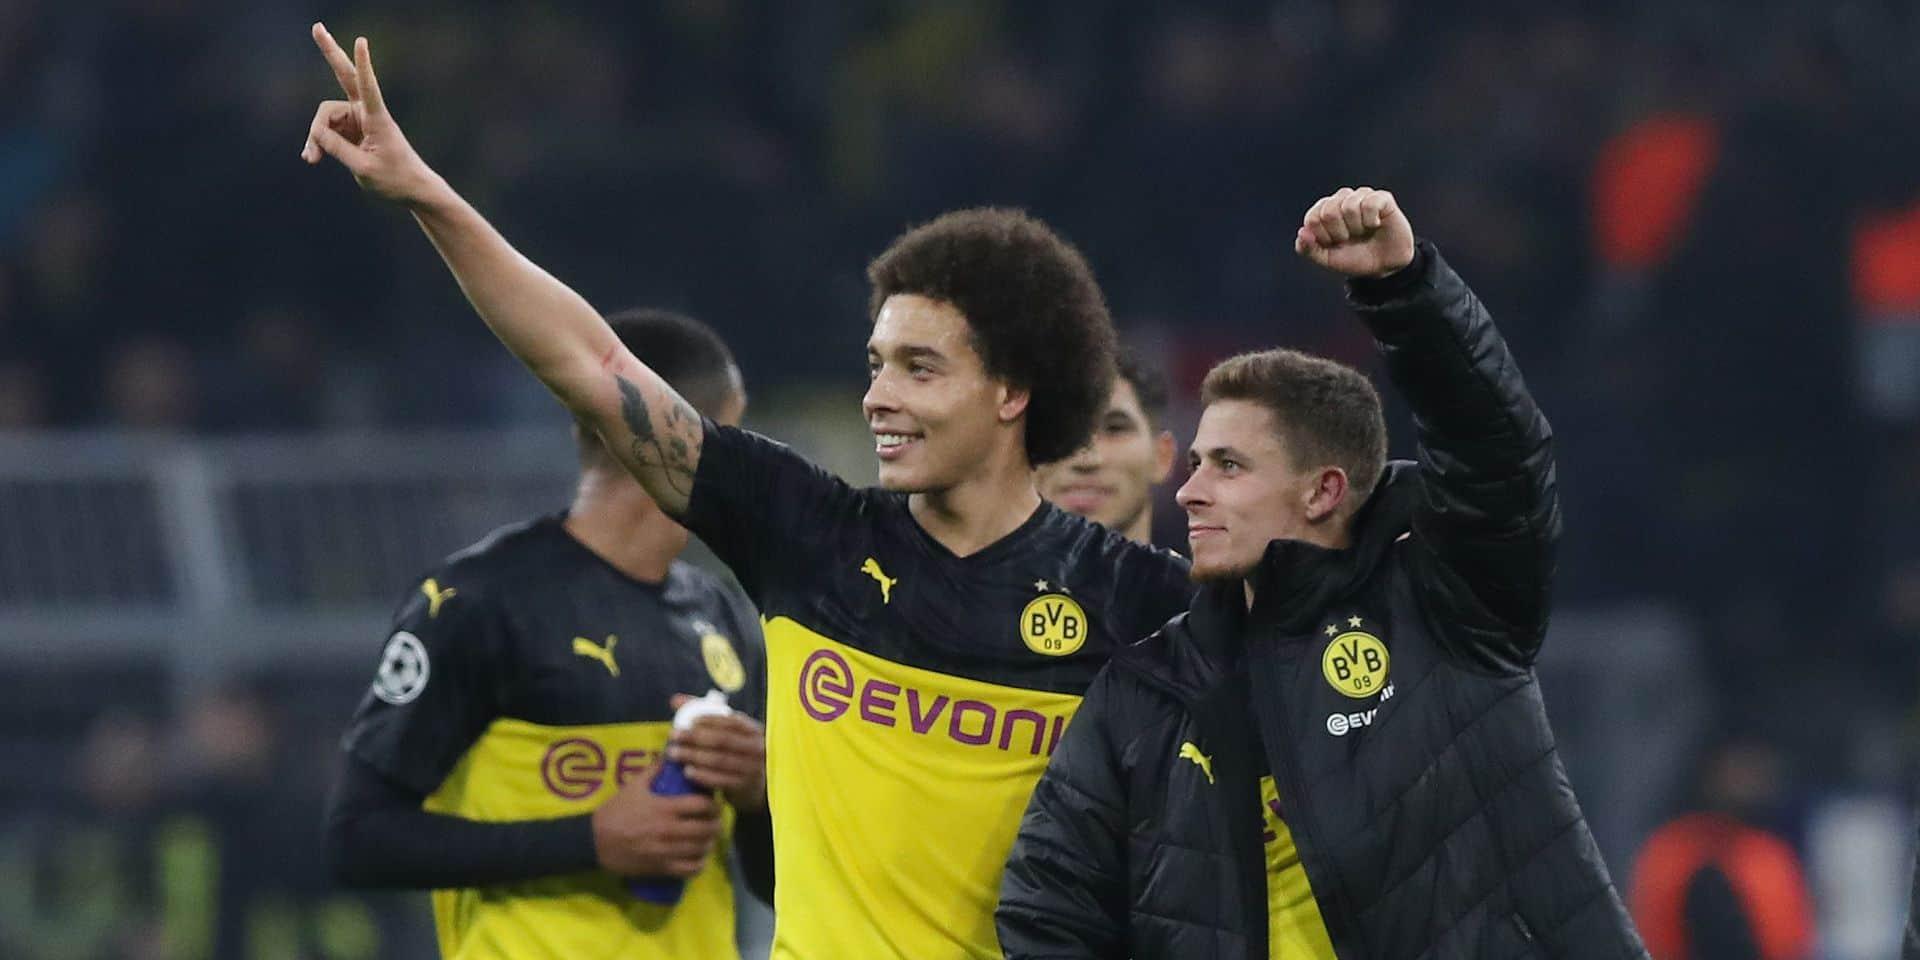 firo: 05.11.2019, football, UEFA Champions League, CL, season 2019/2020, BVB, Borussia Dortmund - Inter Milan